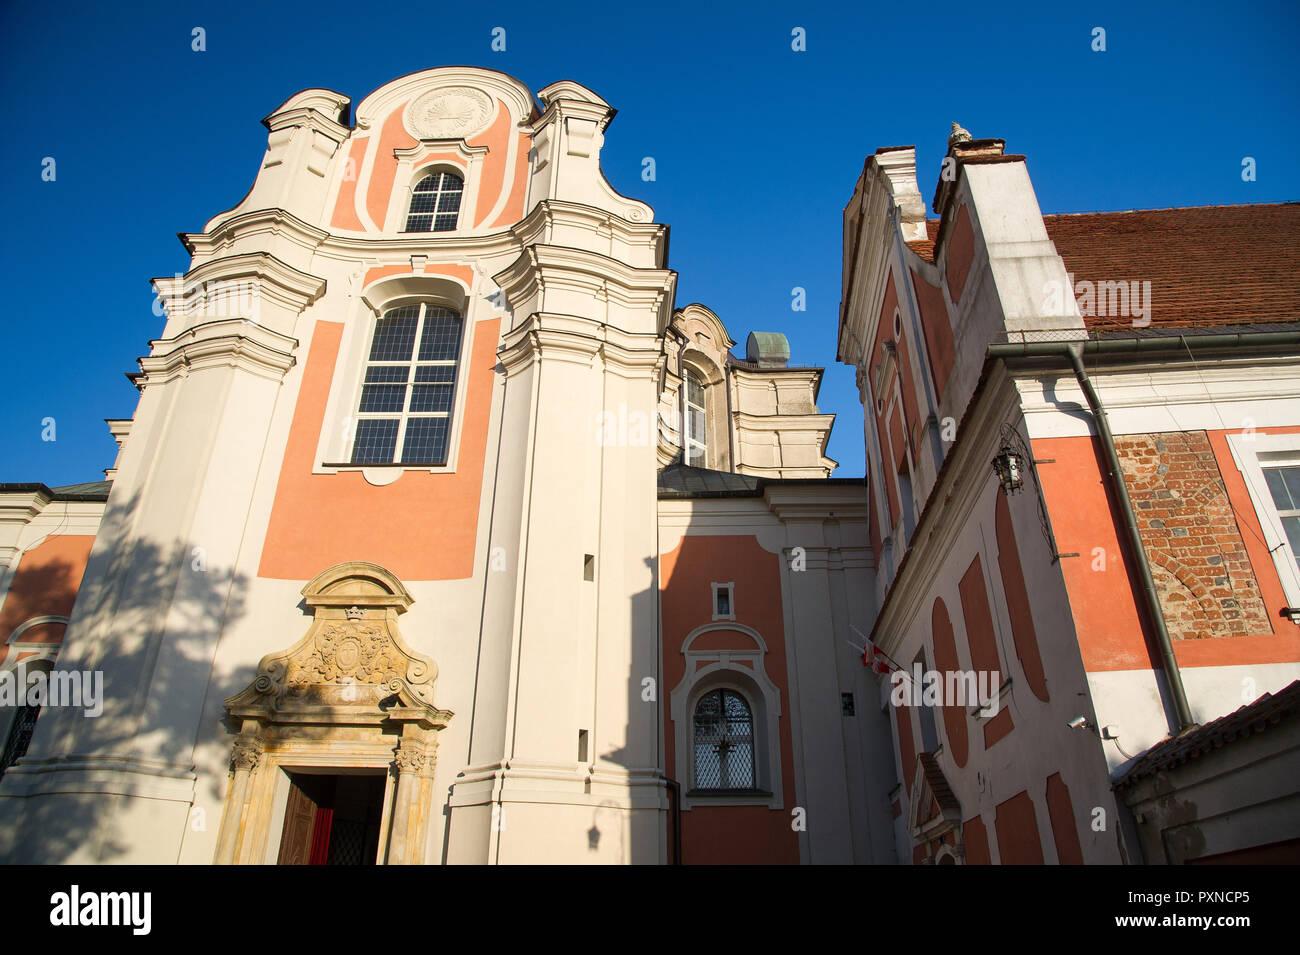 Former Cistercian Abbey in Lad, Poland. October 12th 2018 © Wojciech Strozyk / Alamy Stock Photo - Stock Image